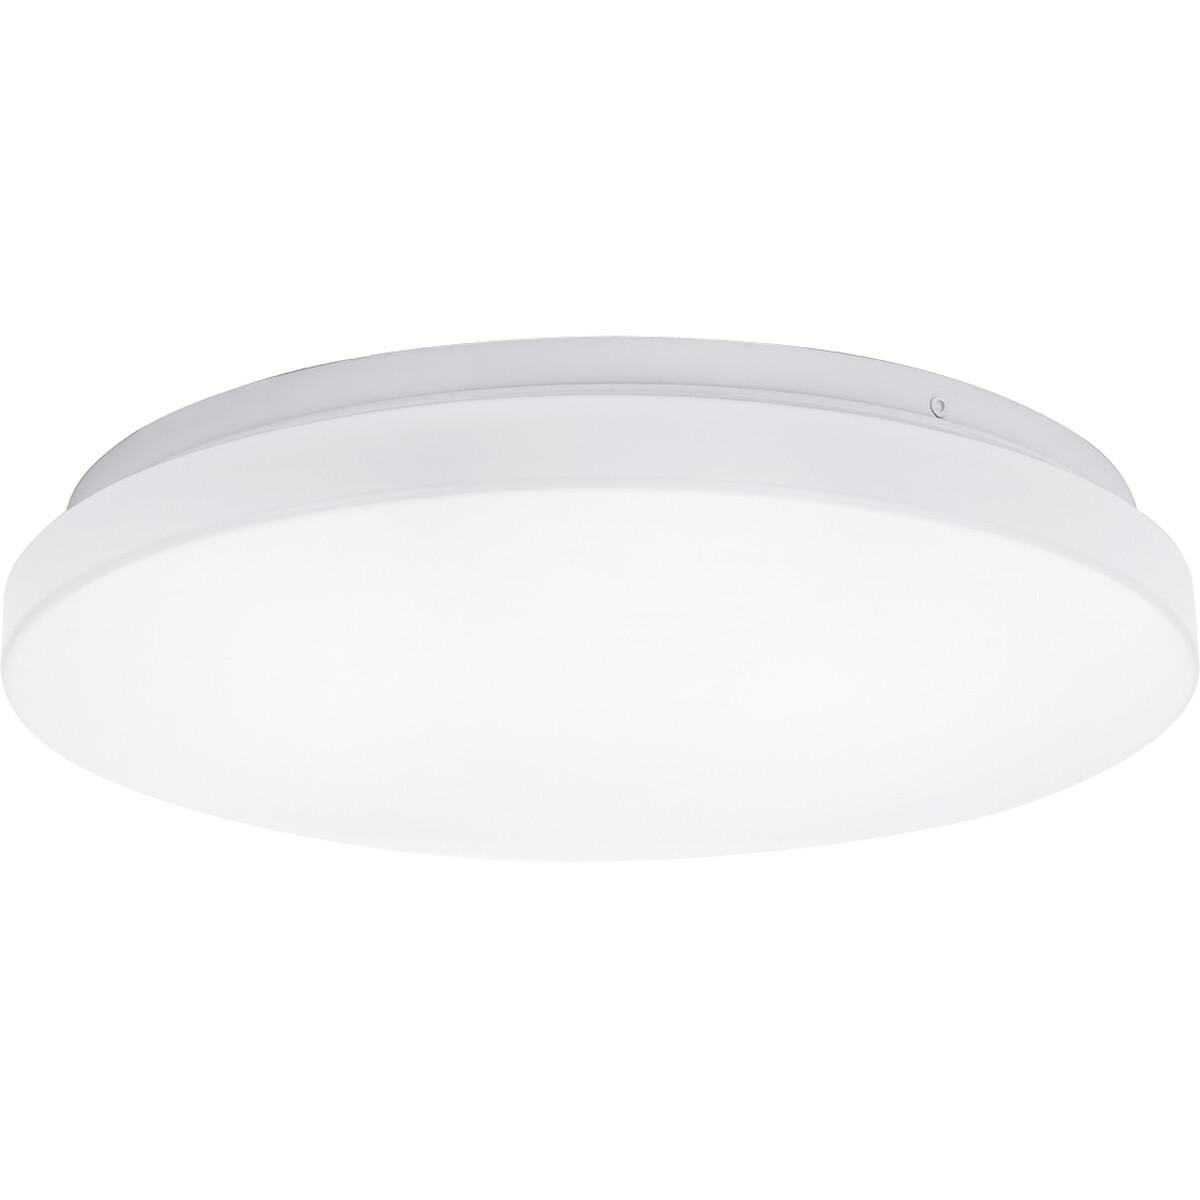 LED Plafondlamp - Aigi Syna - Opbouw Rond 24W - Helder/Koud Wit 6500K - Mat Wit - Aluminium